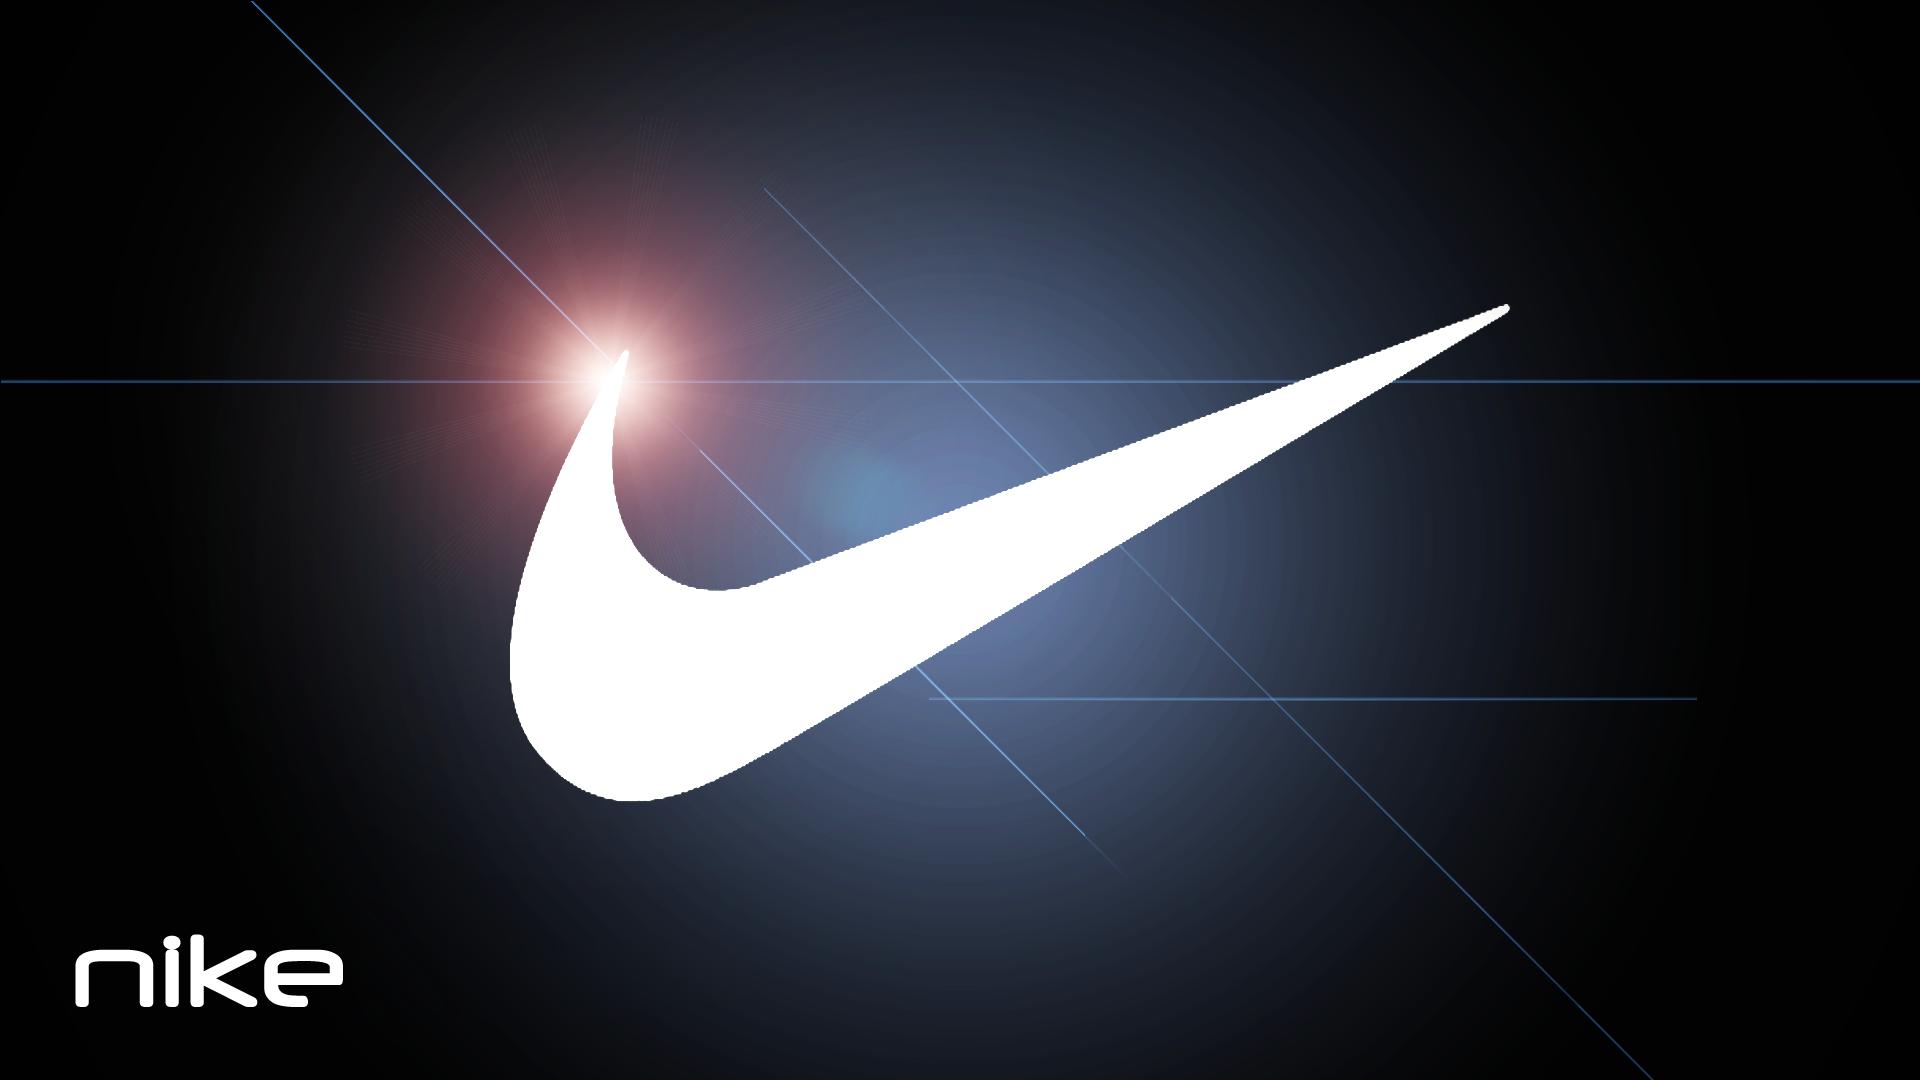 Cool Nike HD Wallpapers 1920x1080